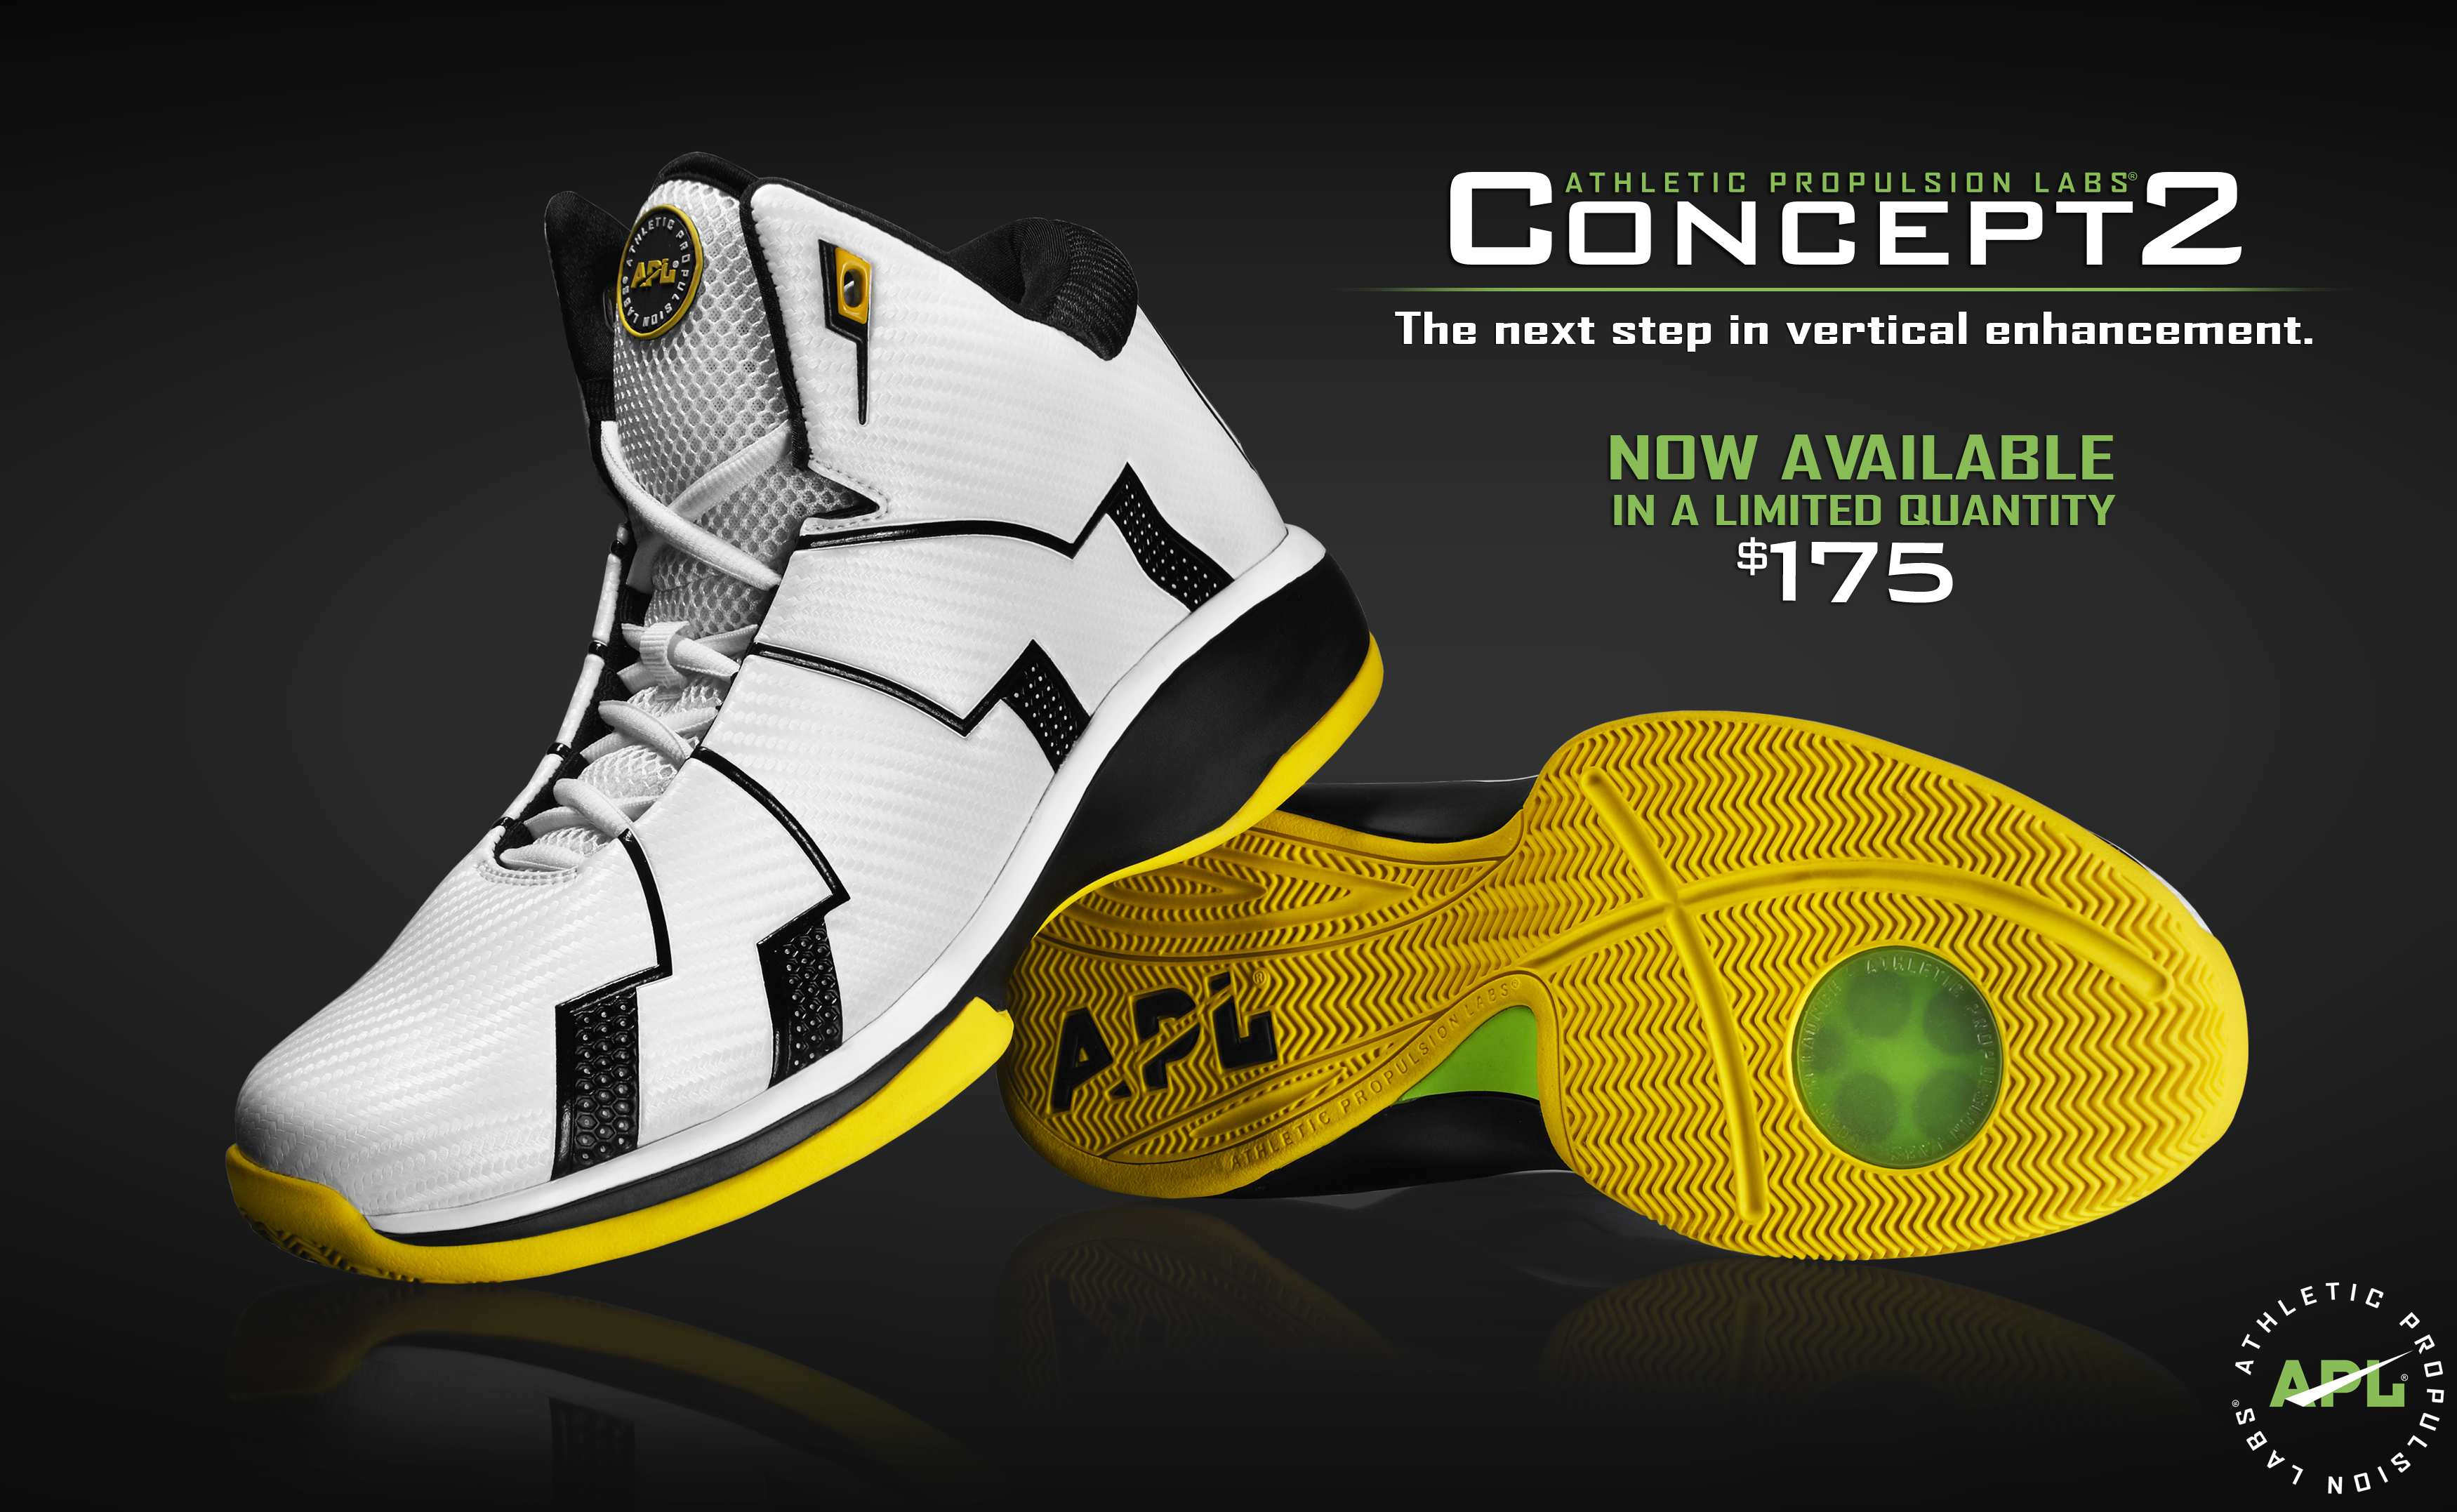 Apl Concept Basketball Shoes